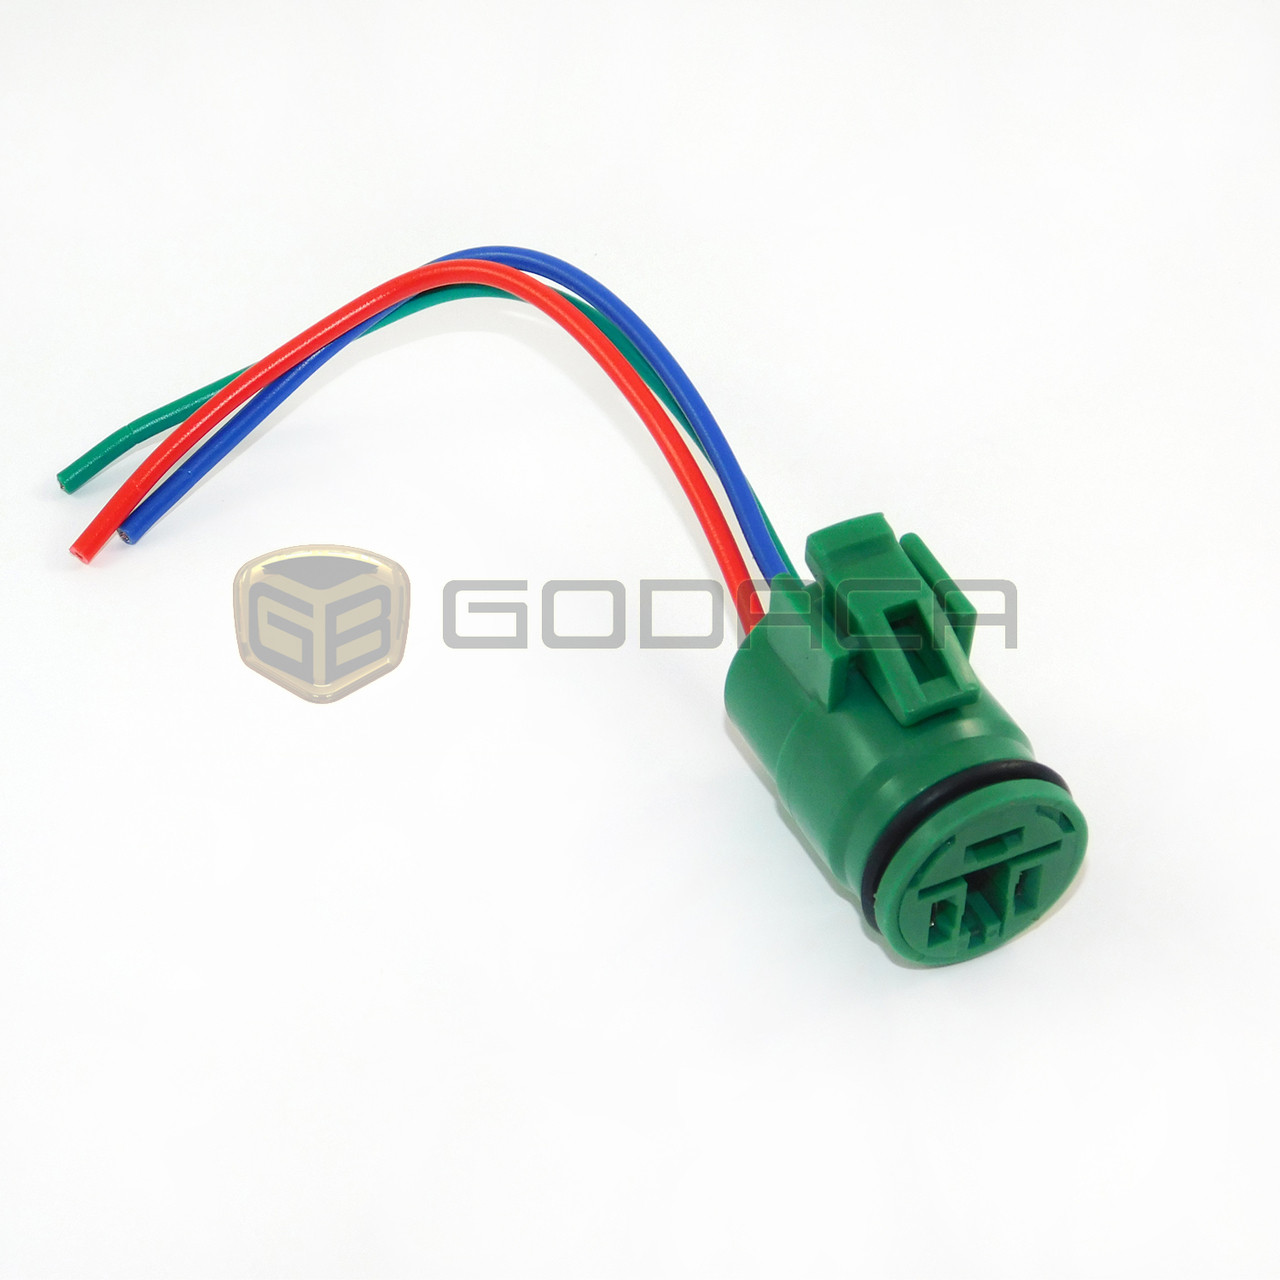 1x connector 3 way 3 pin for toyota alternator 90980 10341 godaca llc  [ 1280 x 1280 Pixel ]